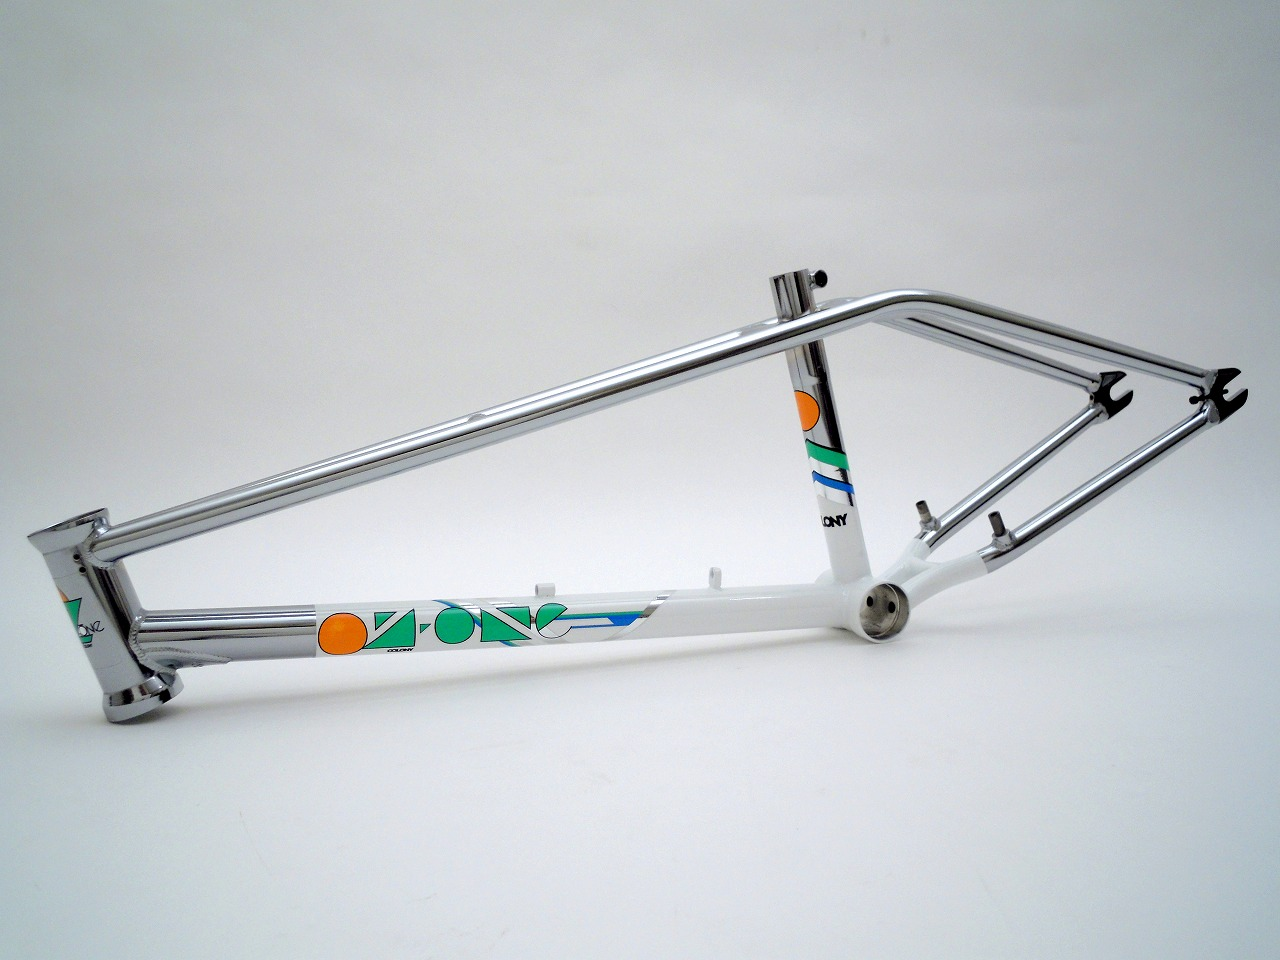 【BMX ストリート フレーム】 COLONY Oz-One Frame TT19.5